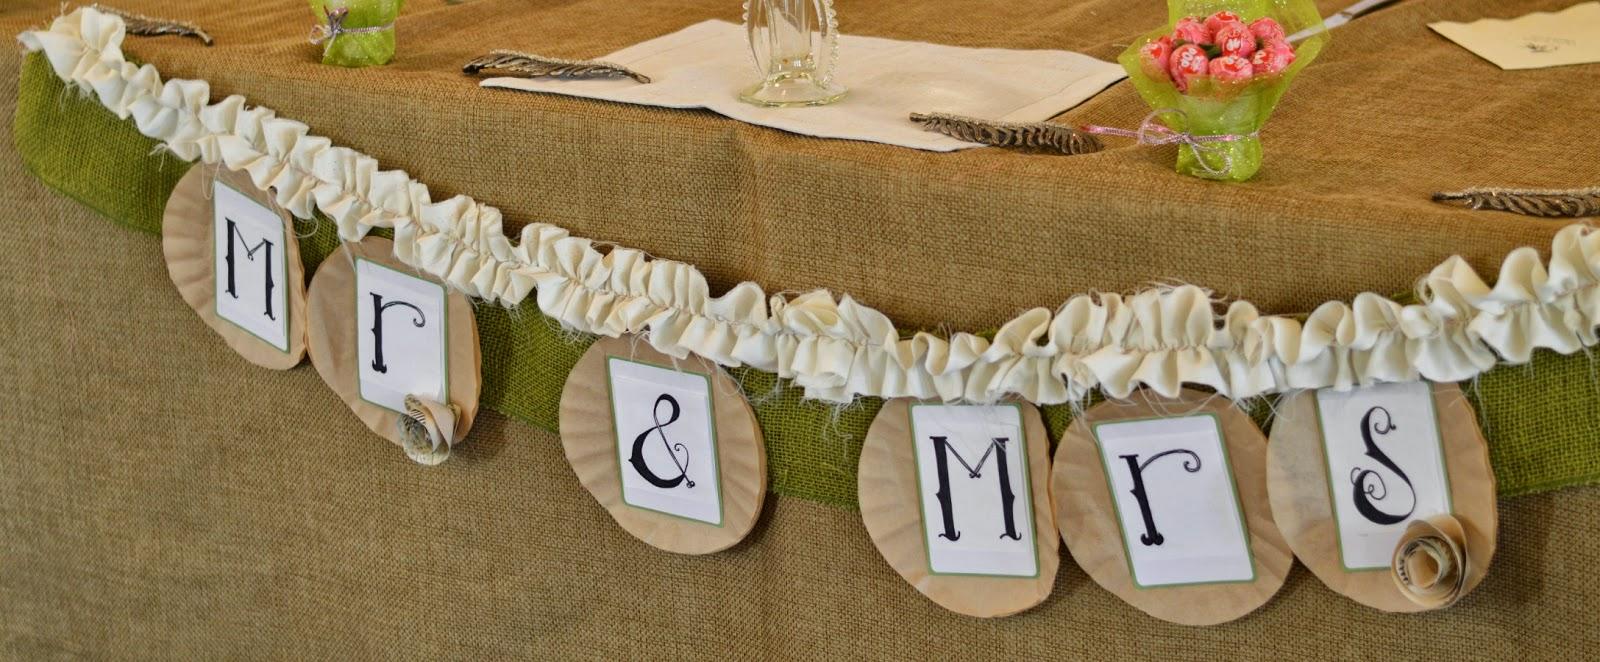 http://craftdictator.com/2014/04/12/diy-wedding-ideas/